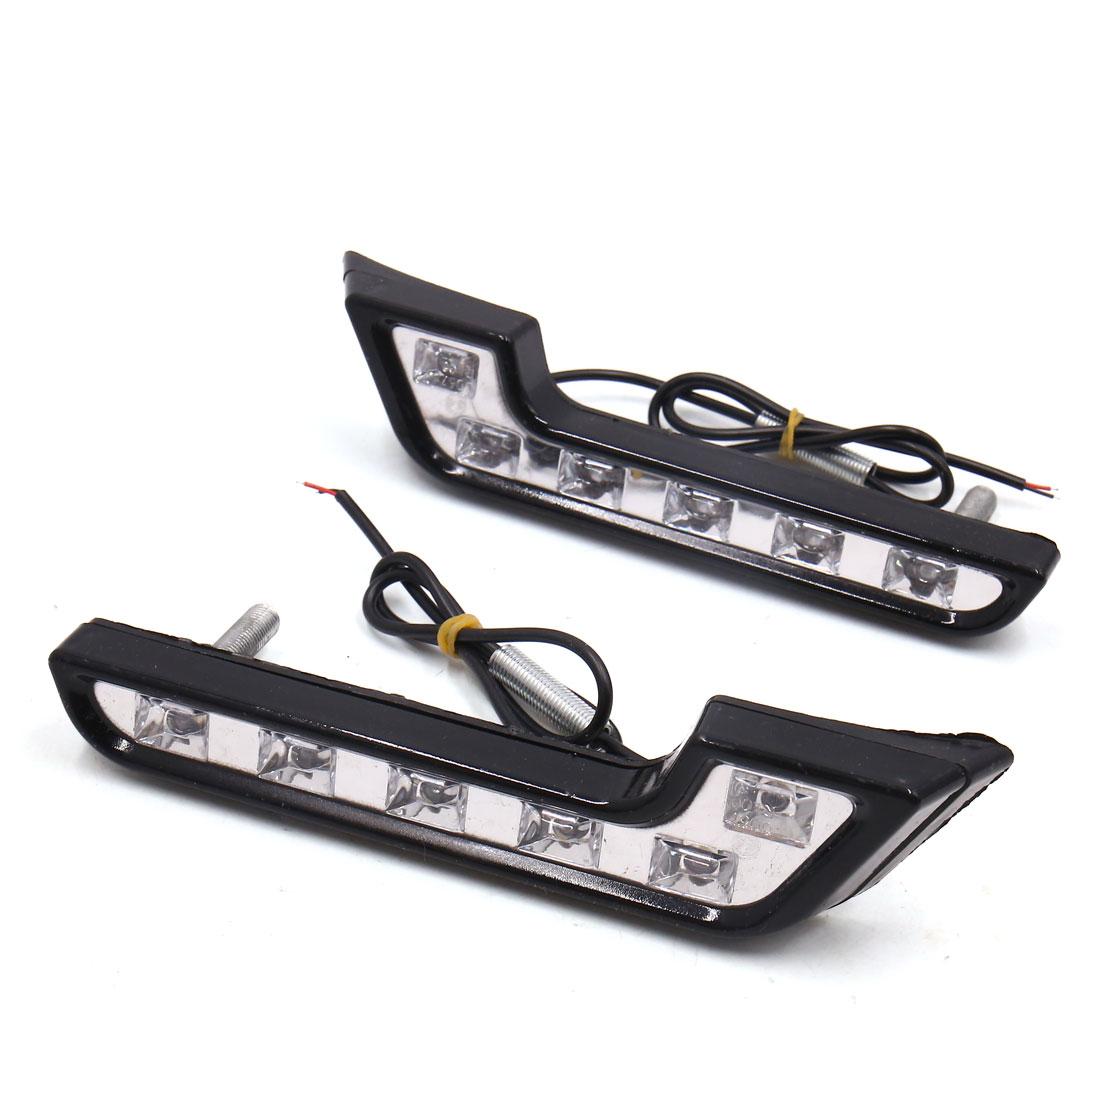 2 Pcs 7 Shaped White Light 12 LED Daytime Driving Running Lamp for Auto Car